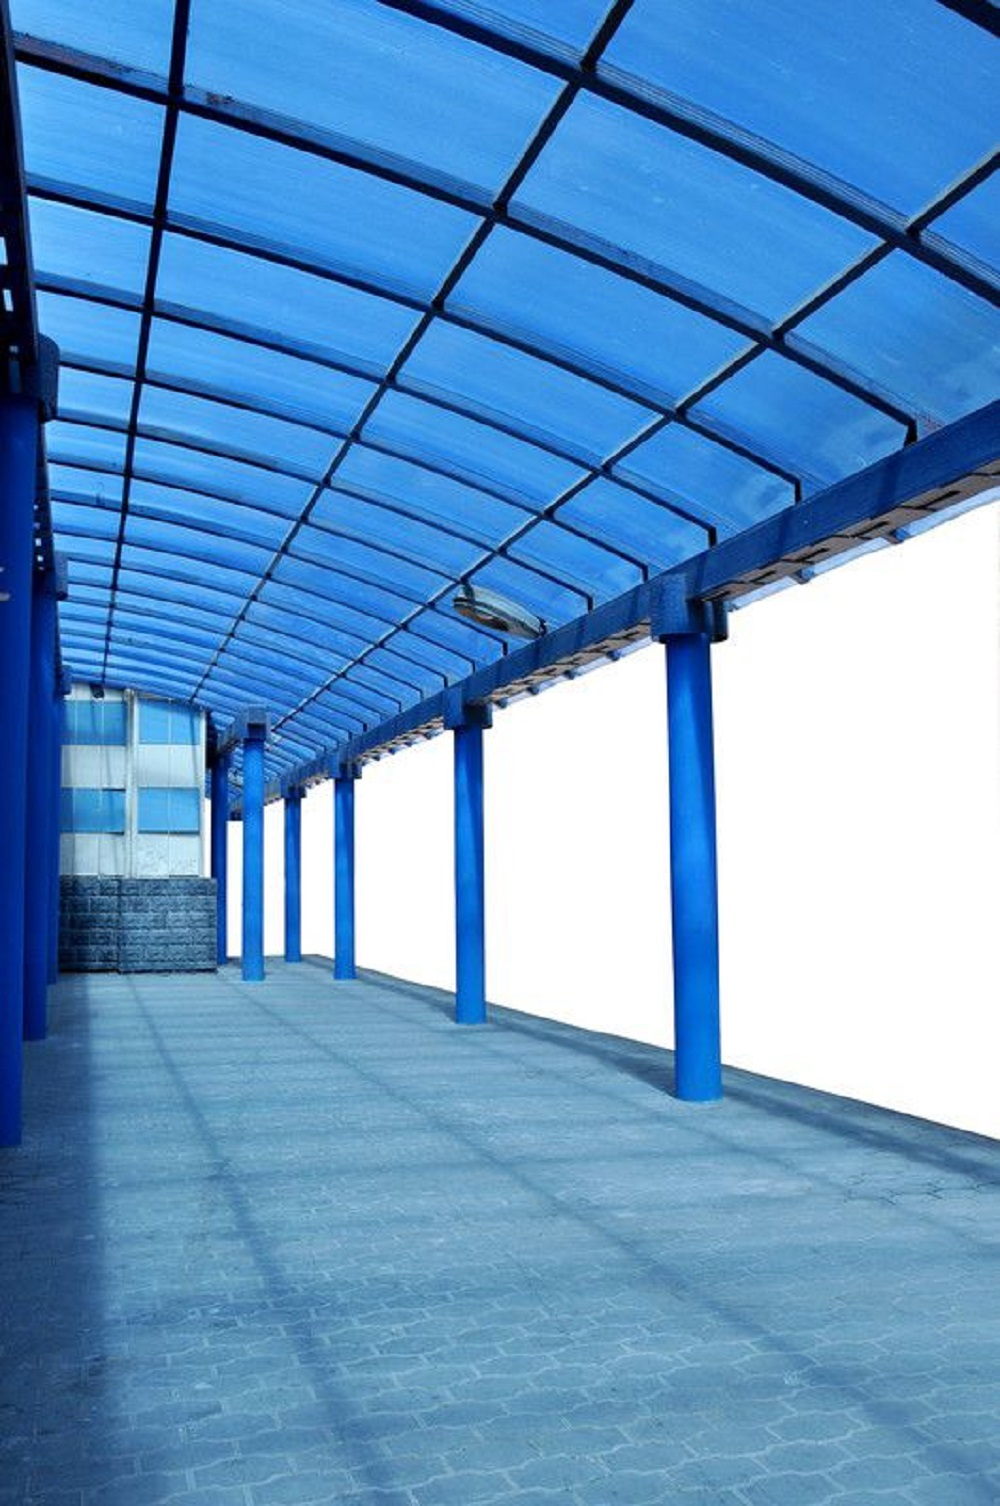 Chapa de Policarbonato Alveolar Azul 10mmx2100mmx6000mm